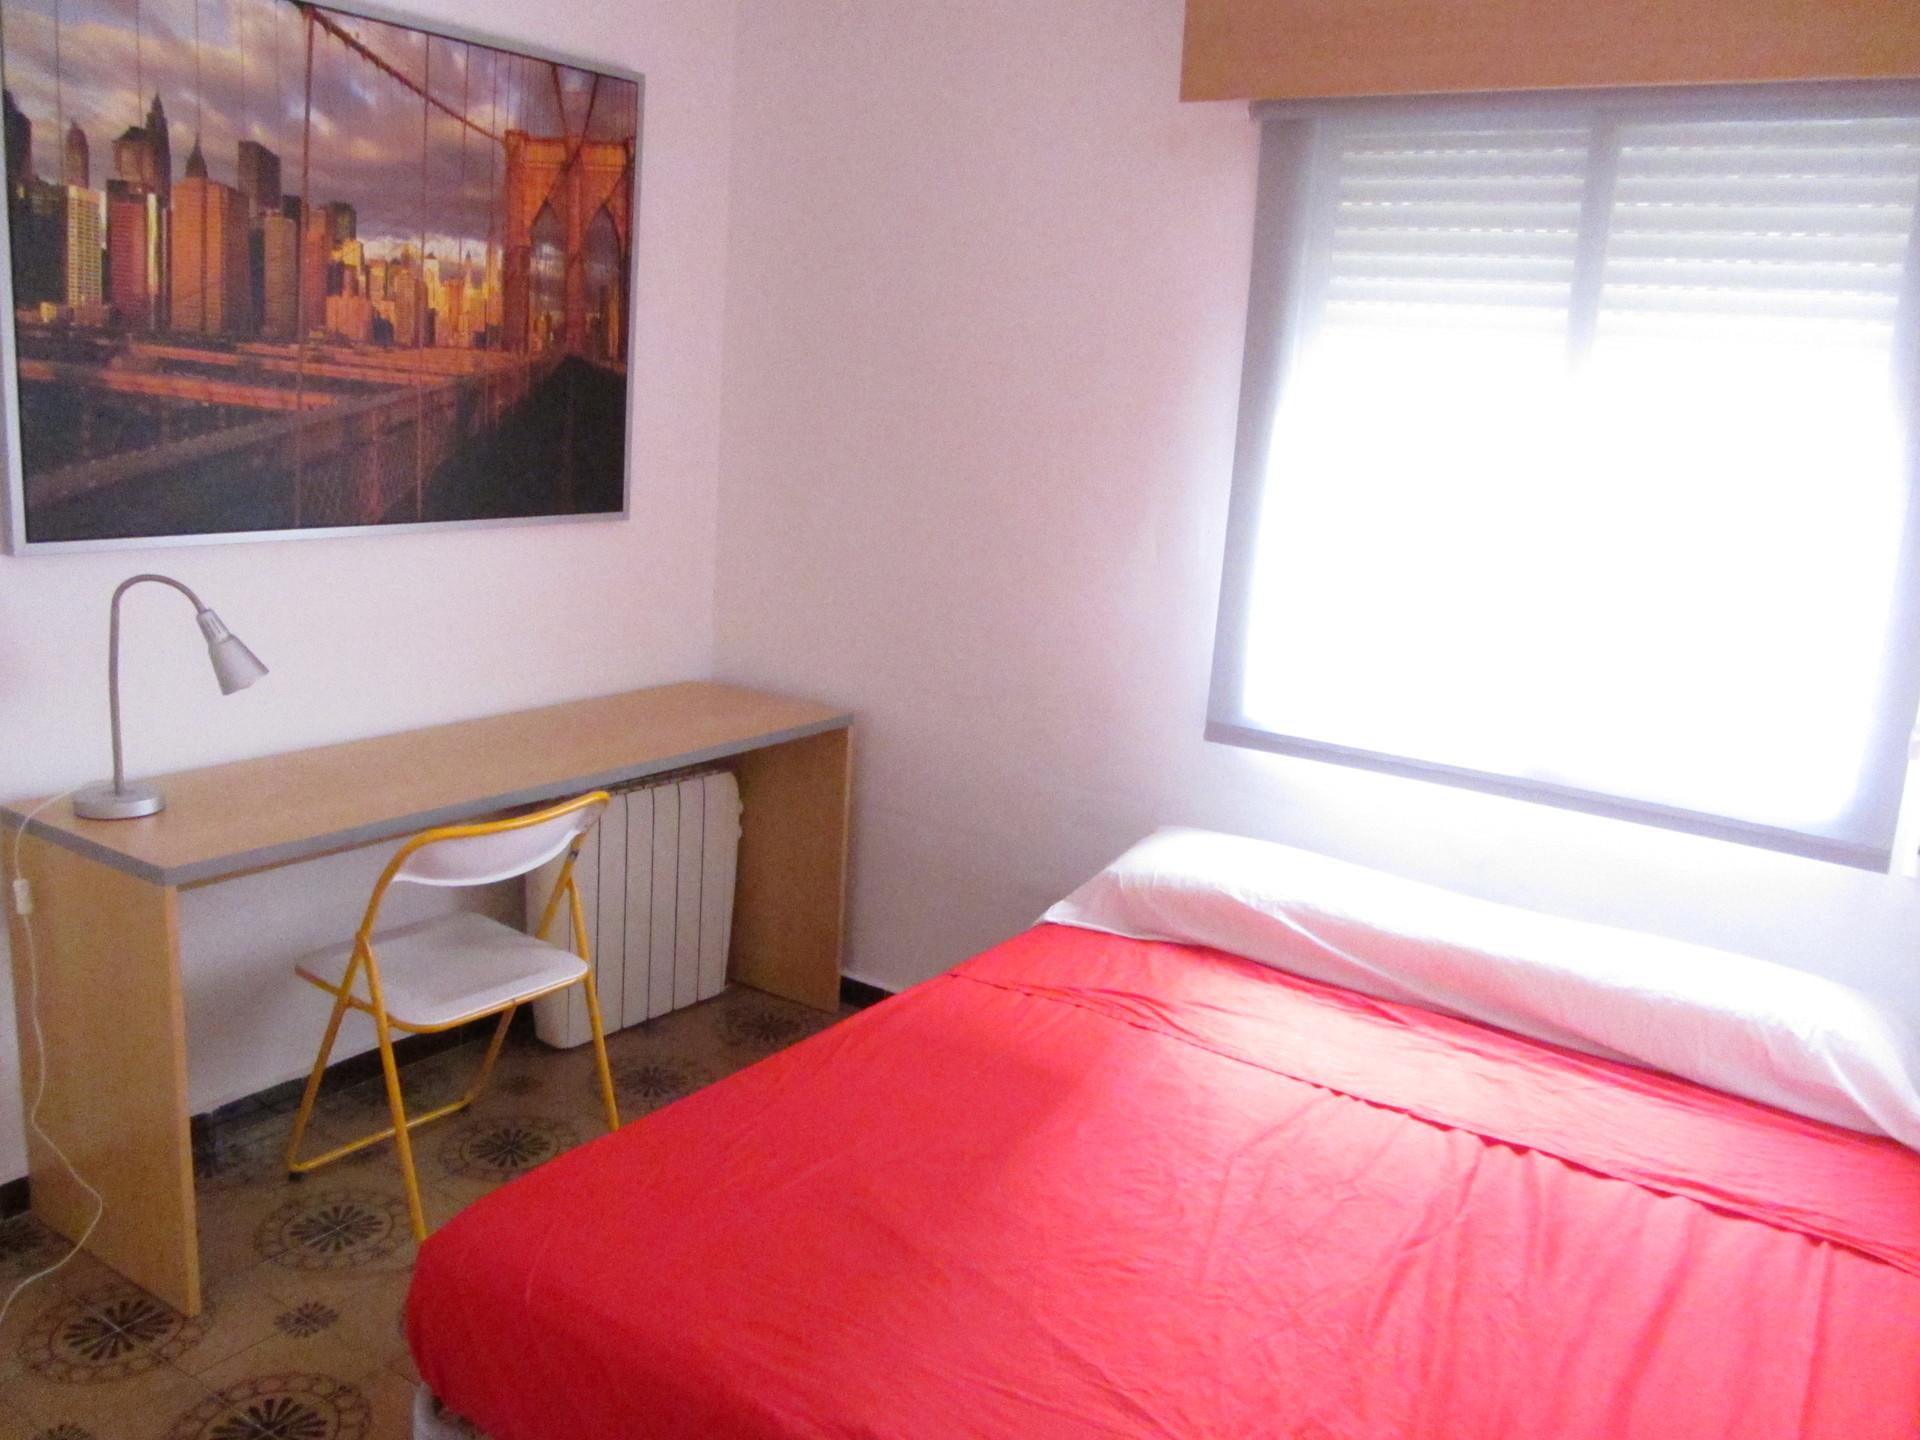 Luminosa habitaci n en madrid alquiler habitaciones madrid for Habitaciones individuales en alquiler